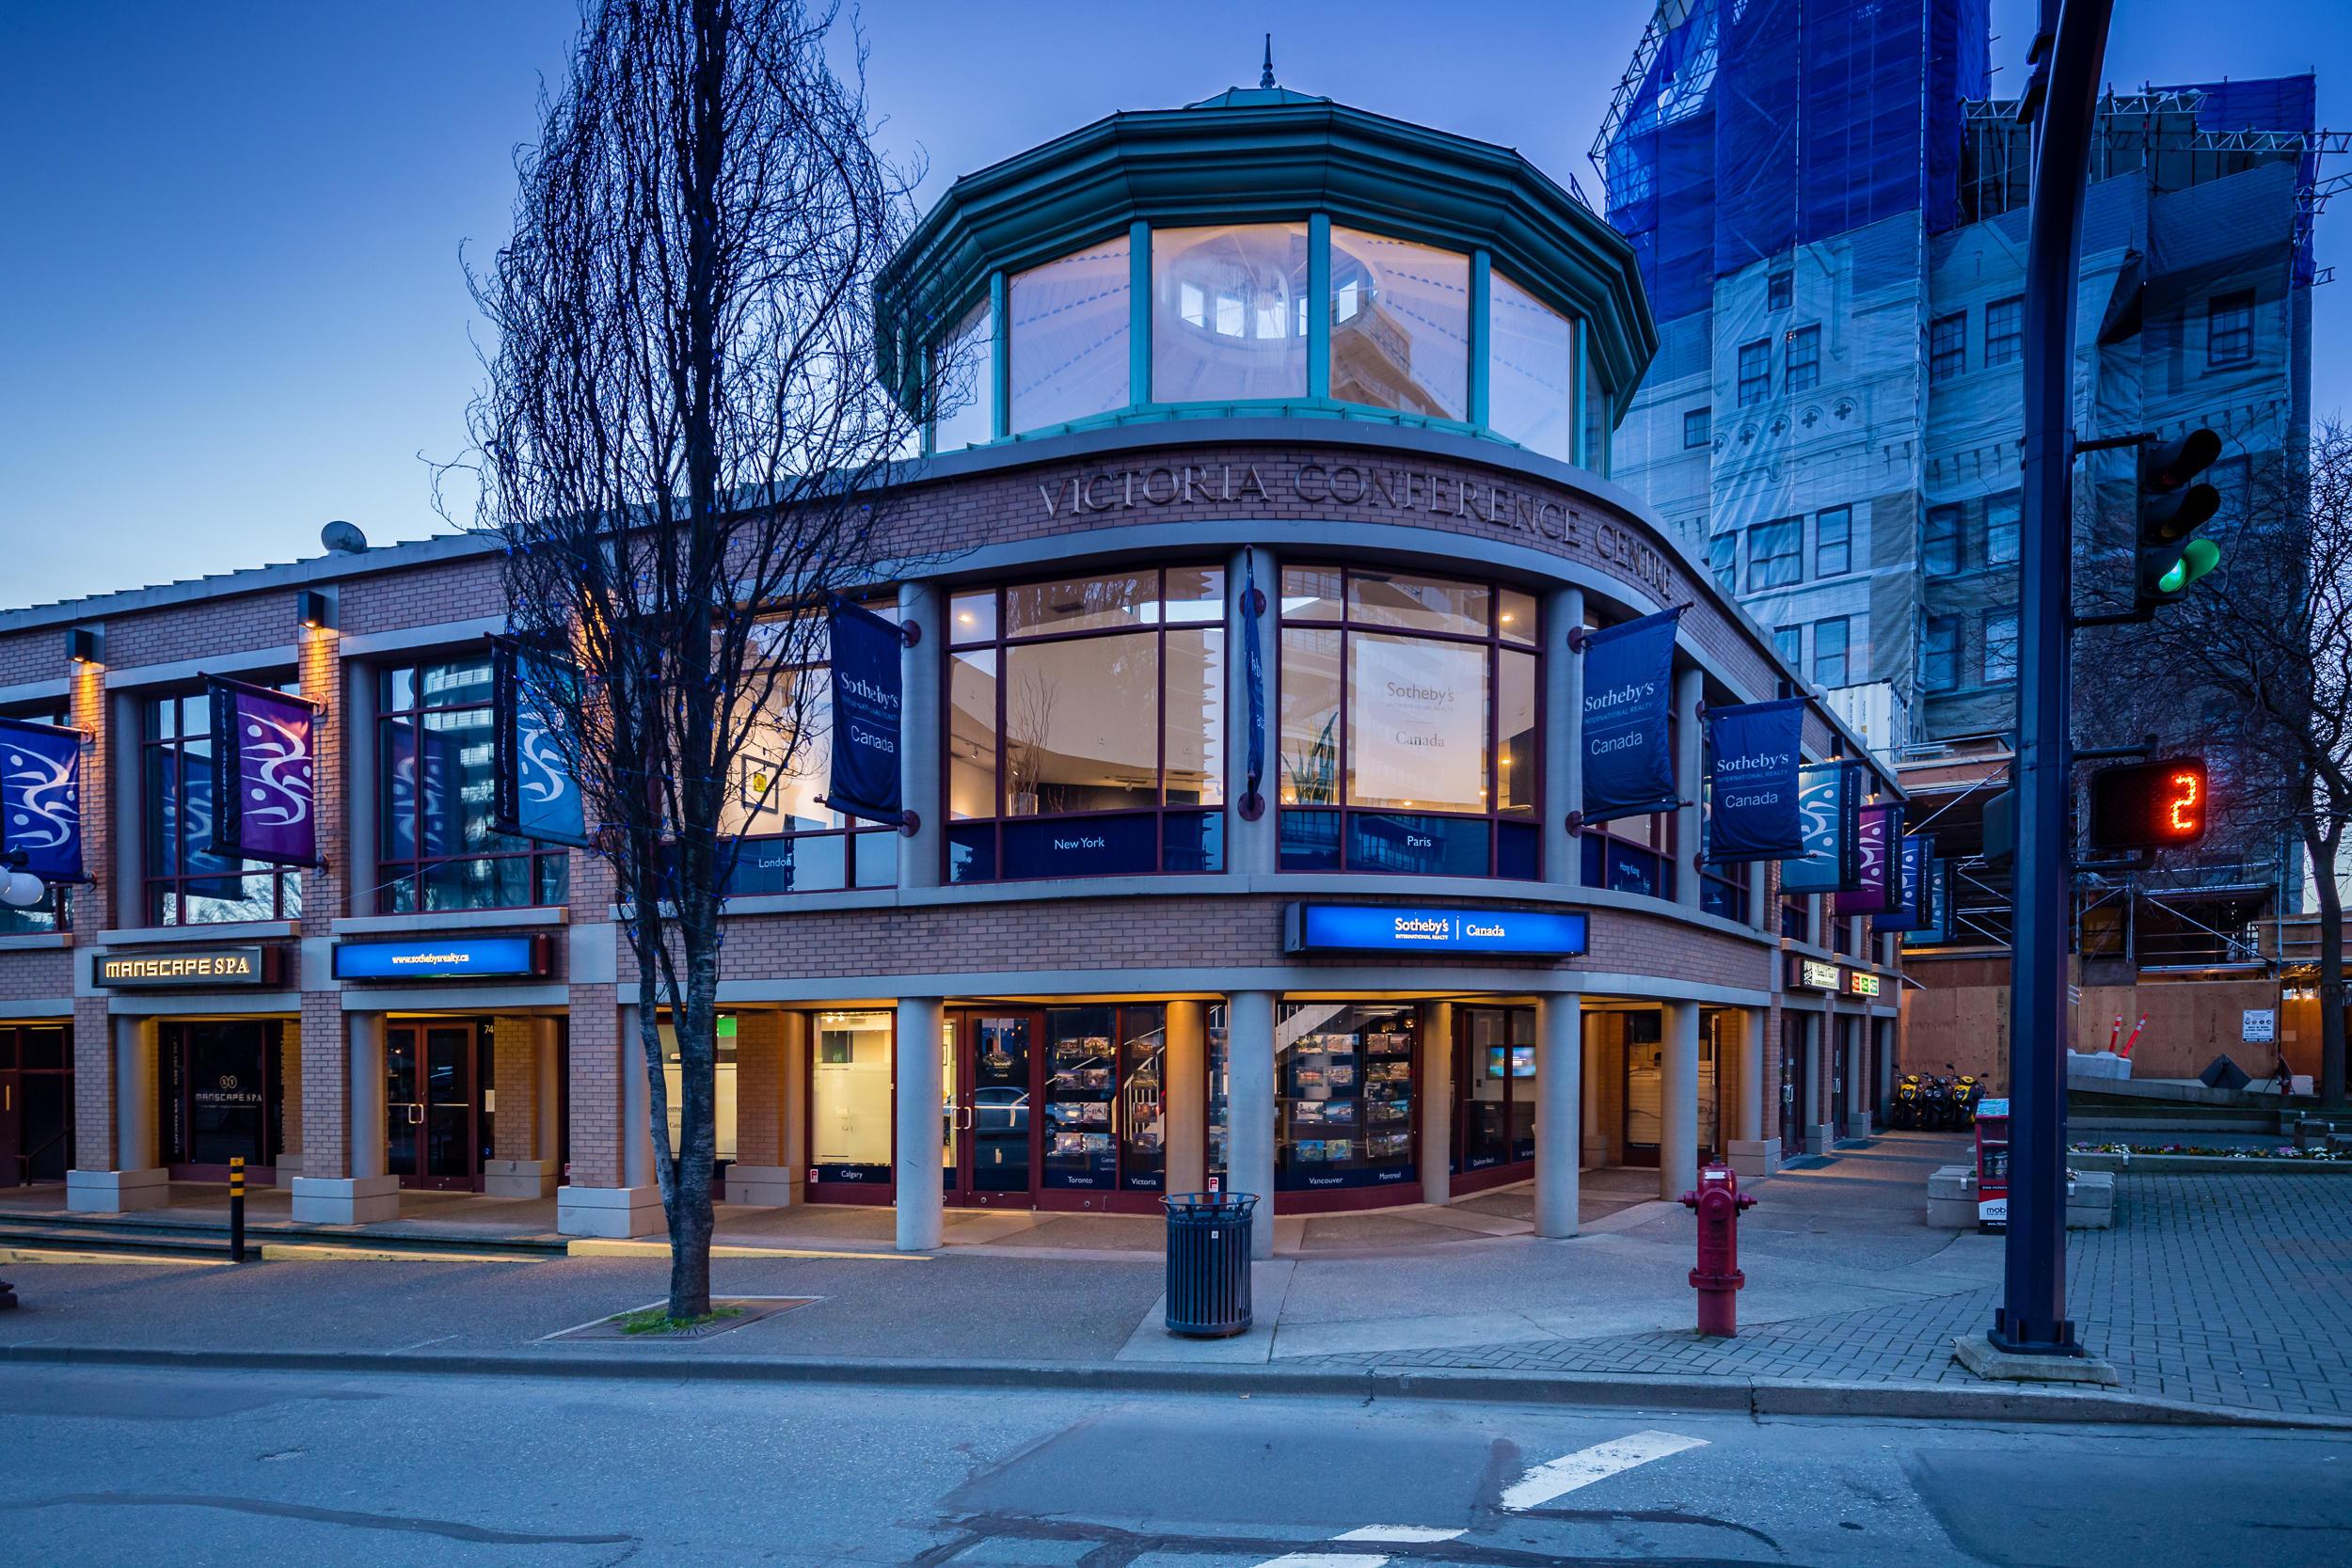 Sotheby's International Realty Canada Victoria (250)380-3933